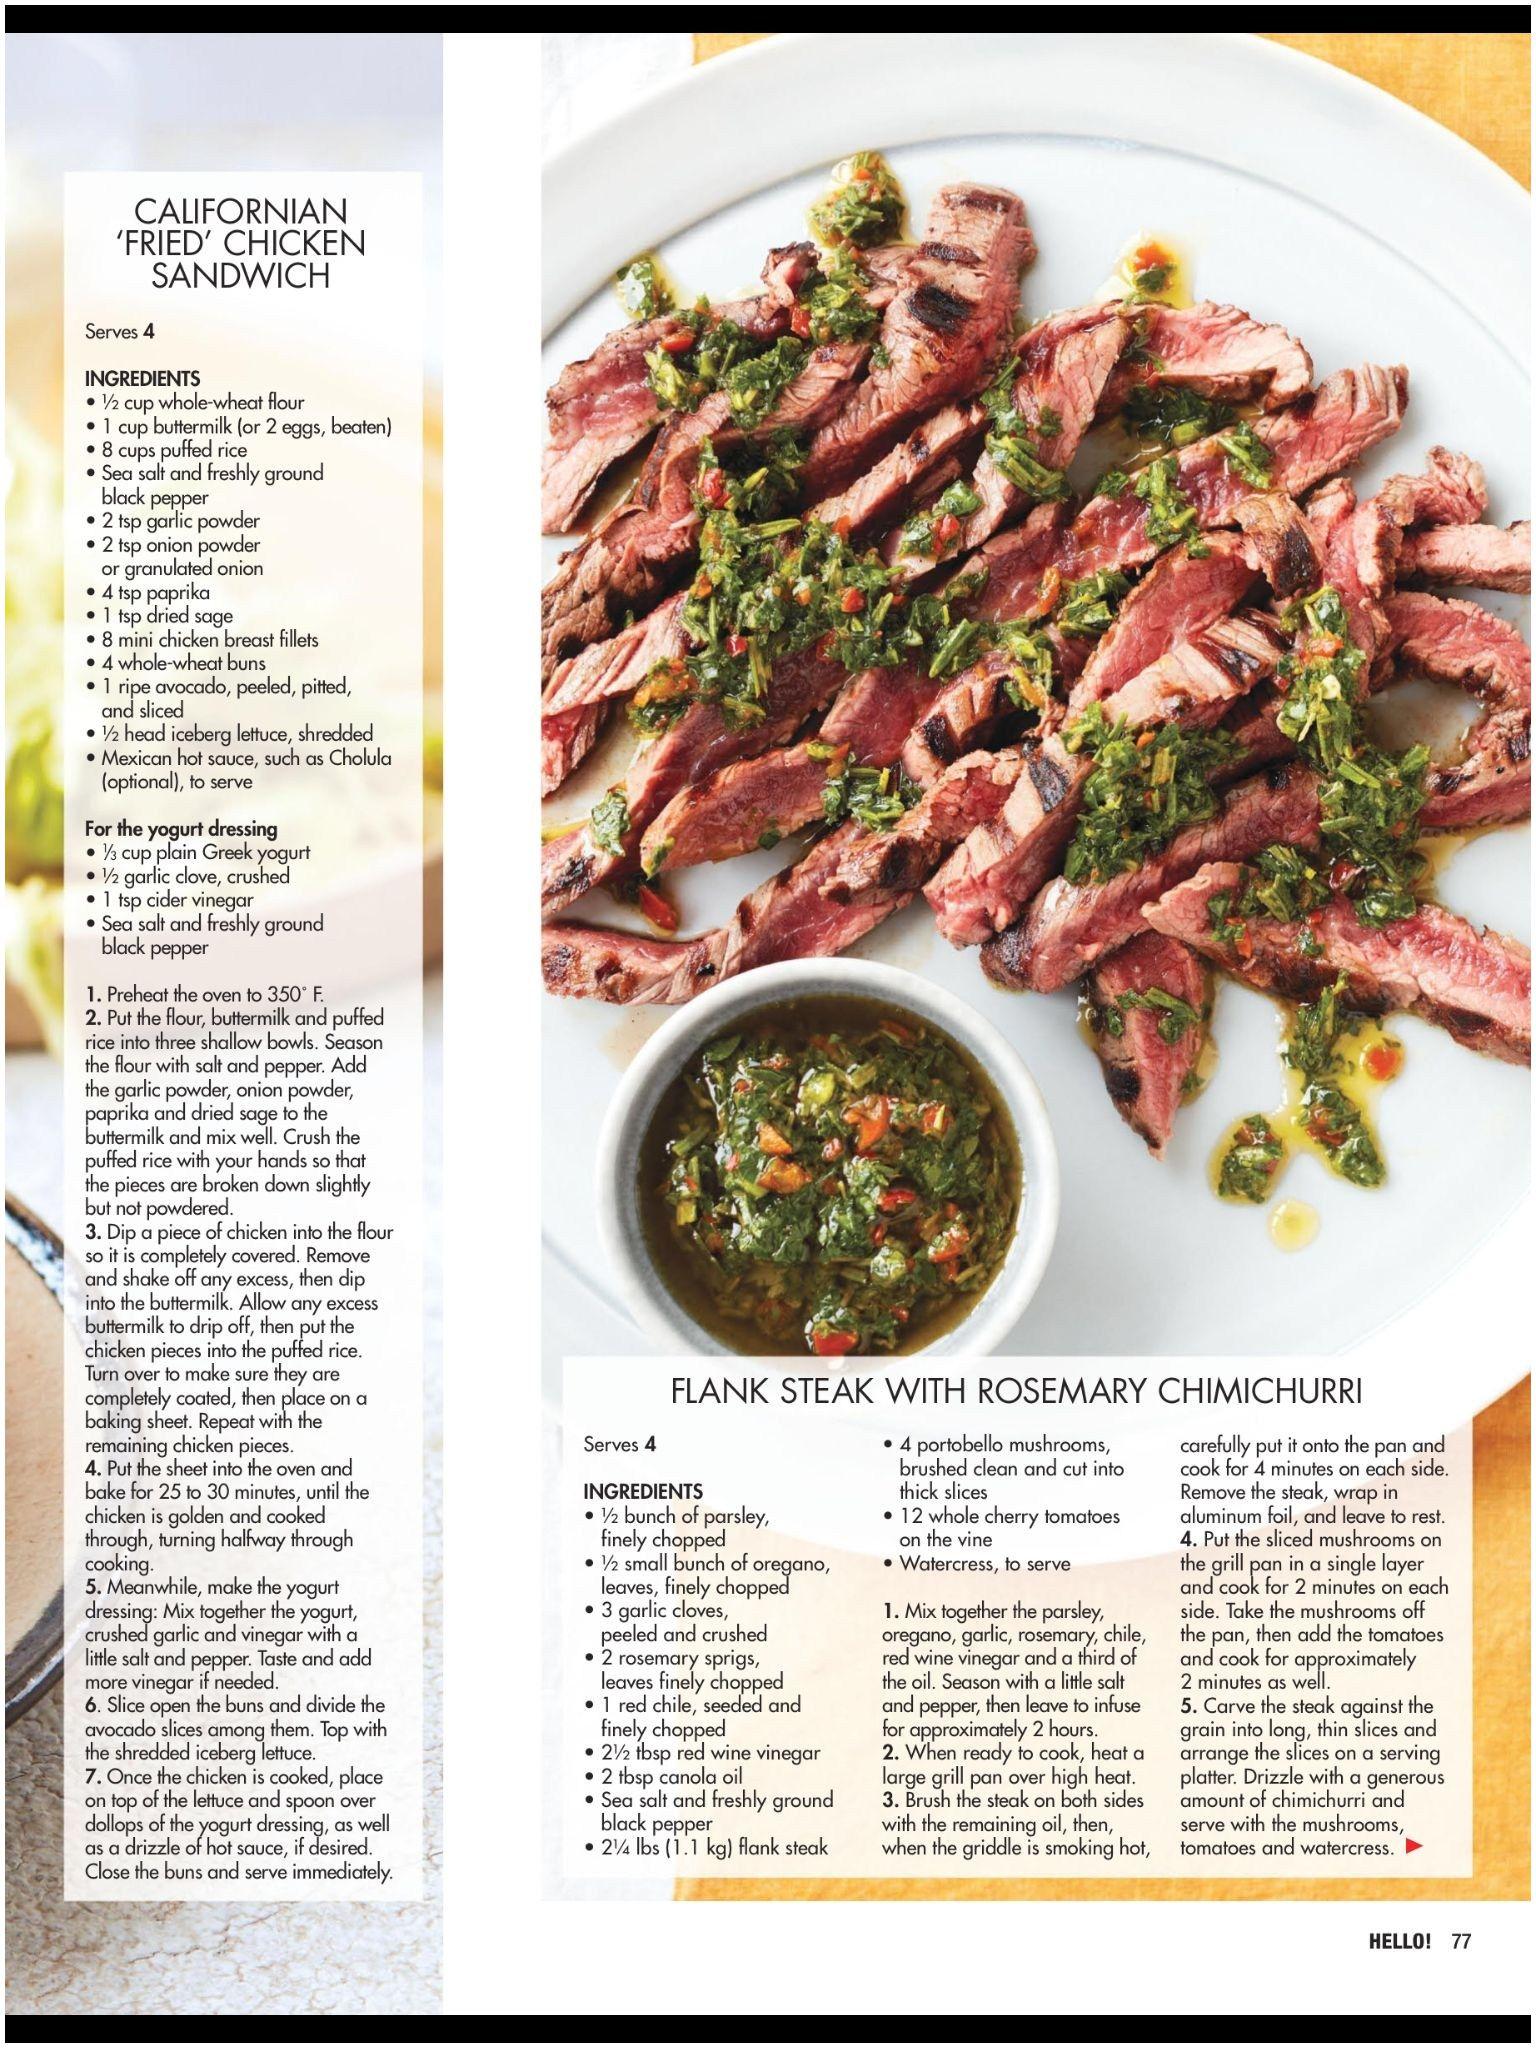 Top Food Magazines 48 top Food Magazines Magazine Gallery